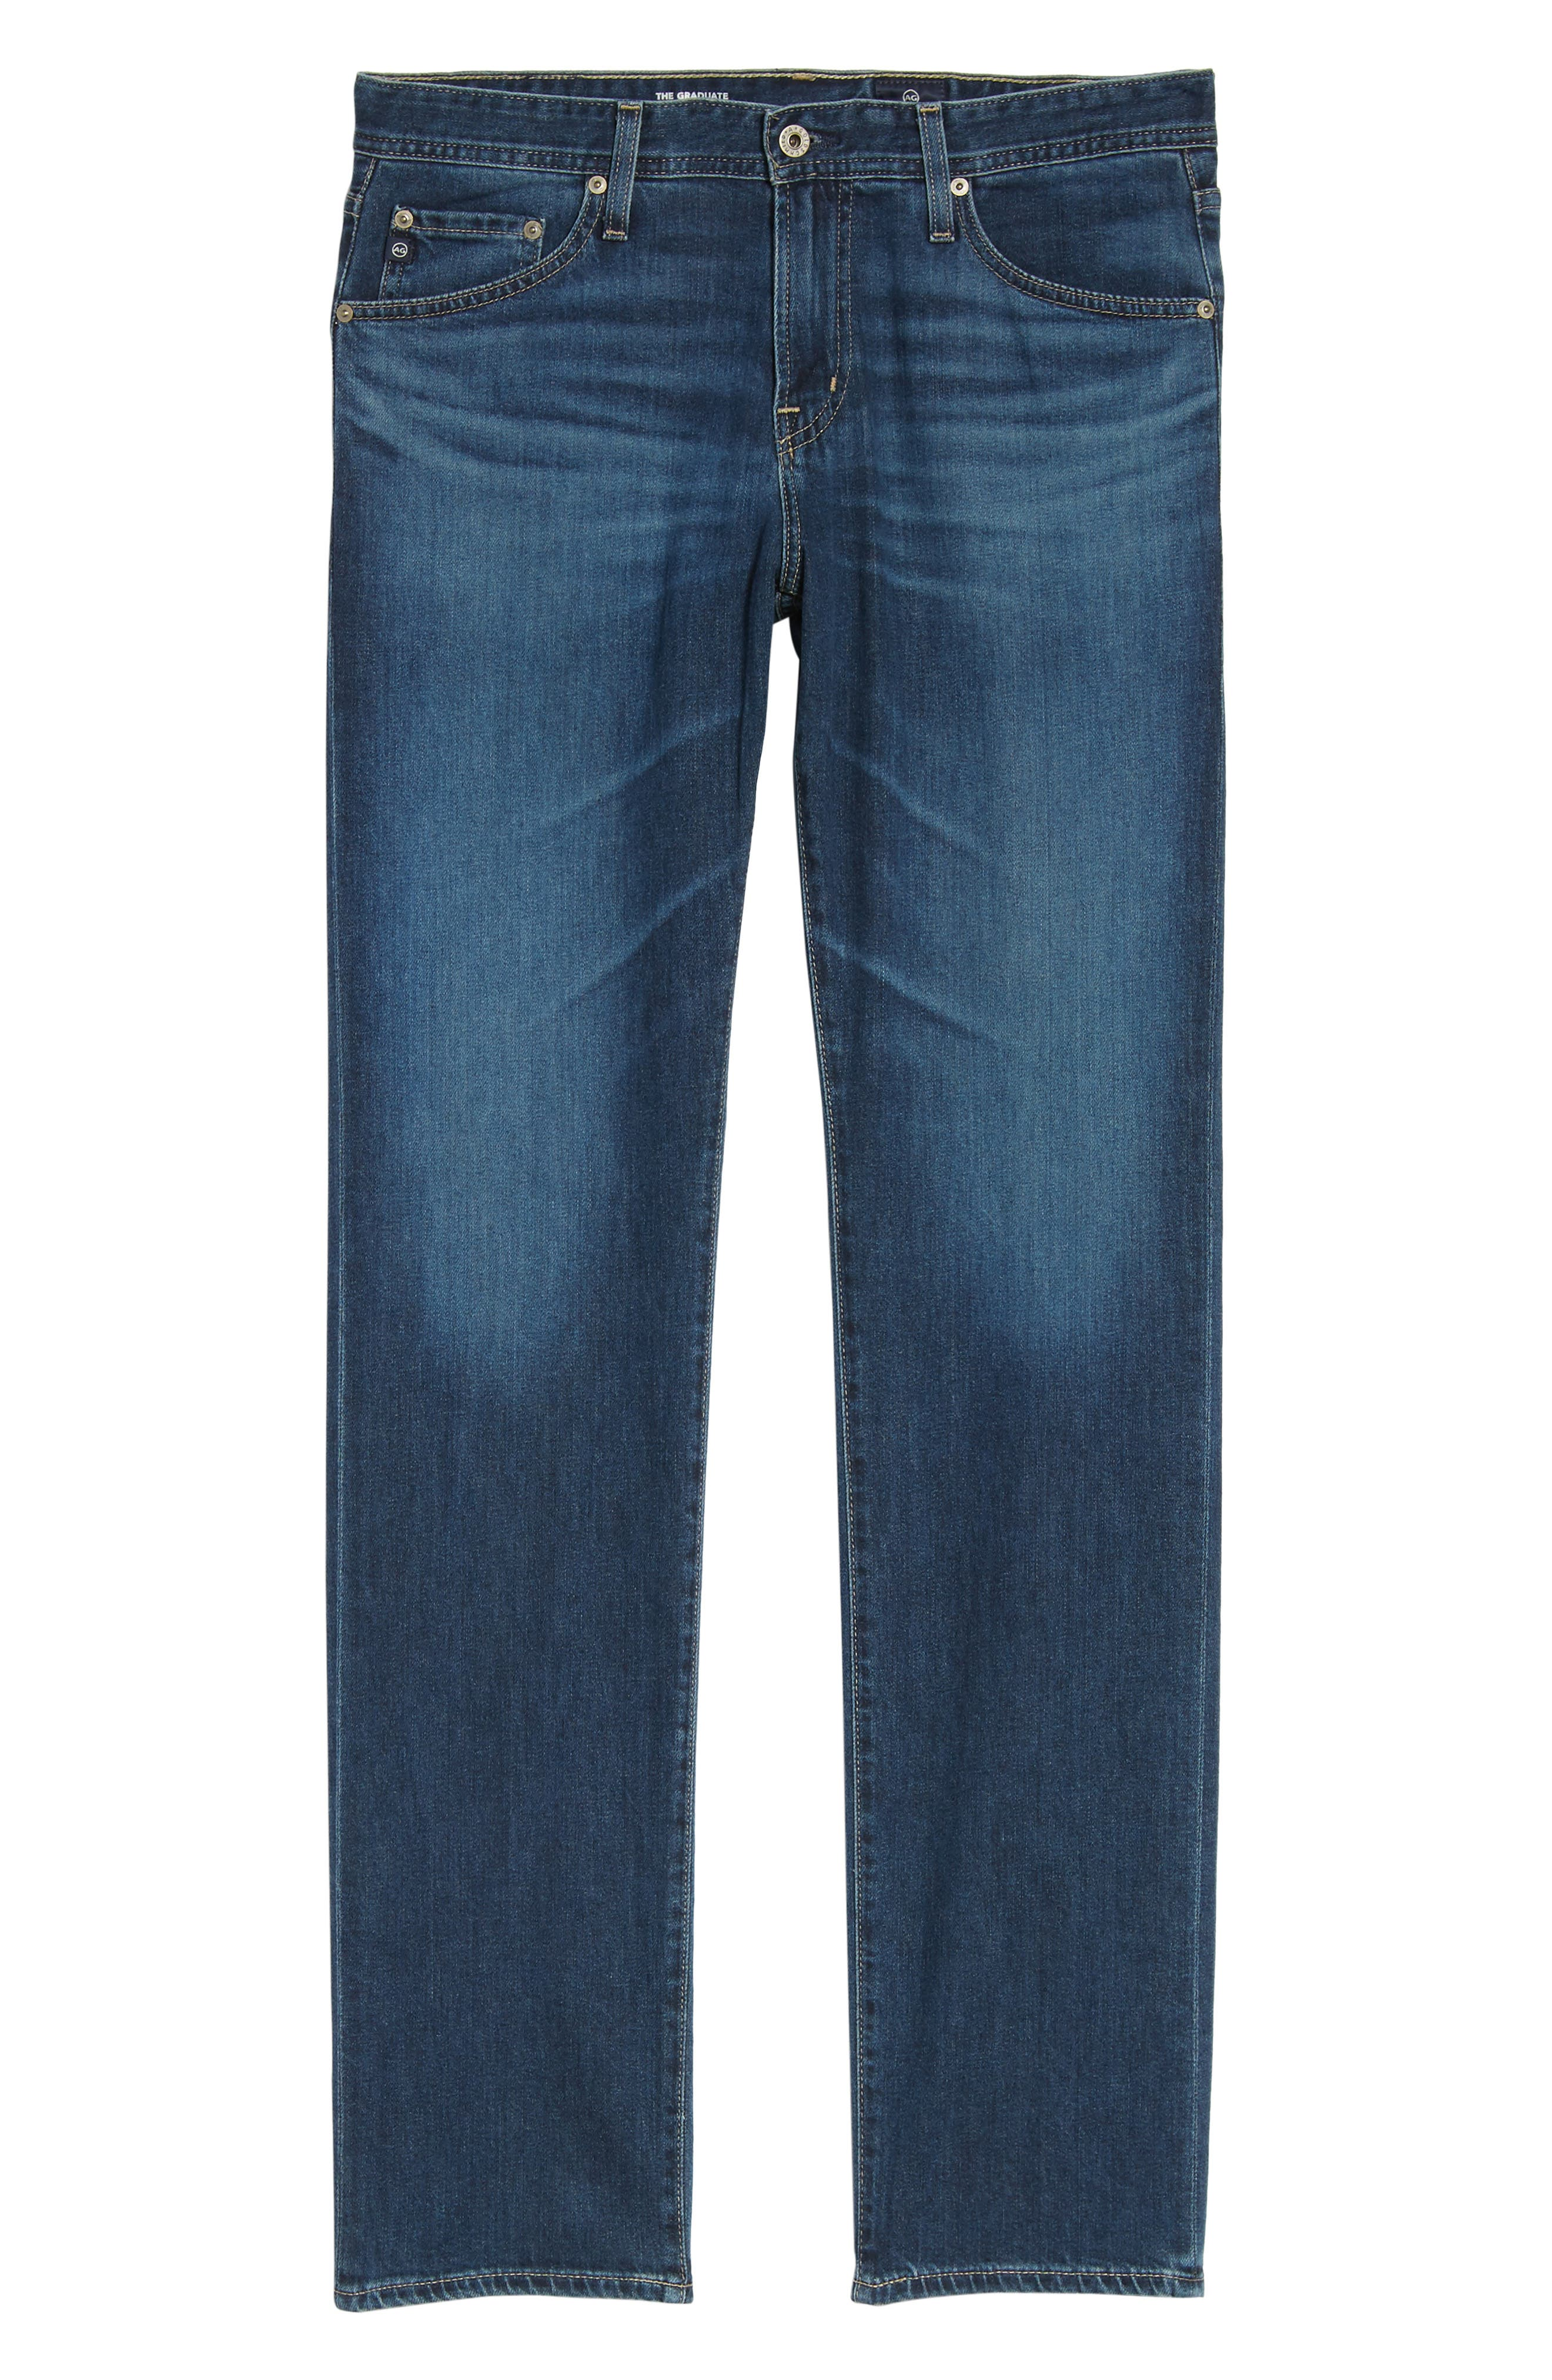 Graduate Slim Straight Leg Jeans,                             Alternate thumbnail 11, color,